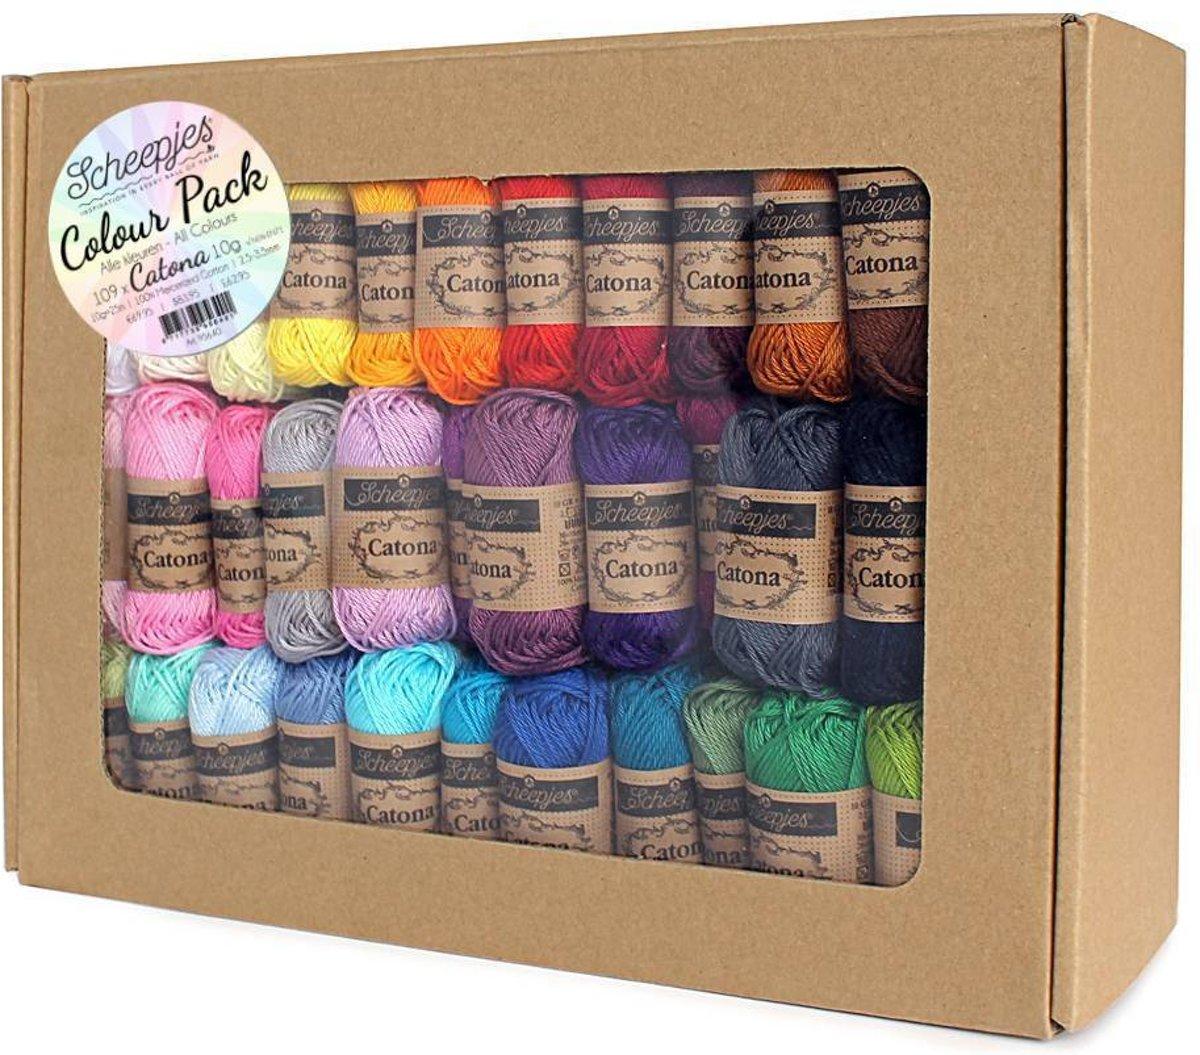 6a003a59eea Scheepjes Catona Colour Pack - 109 kleuren x 10 gram (mini bolletjes)